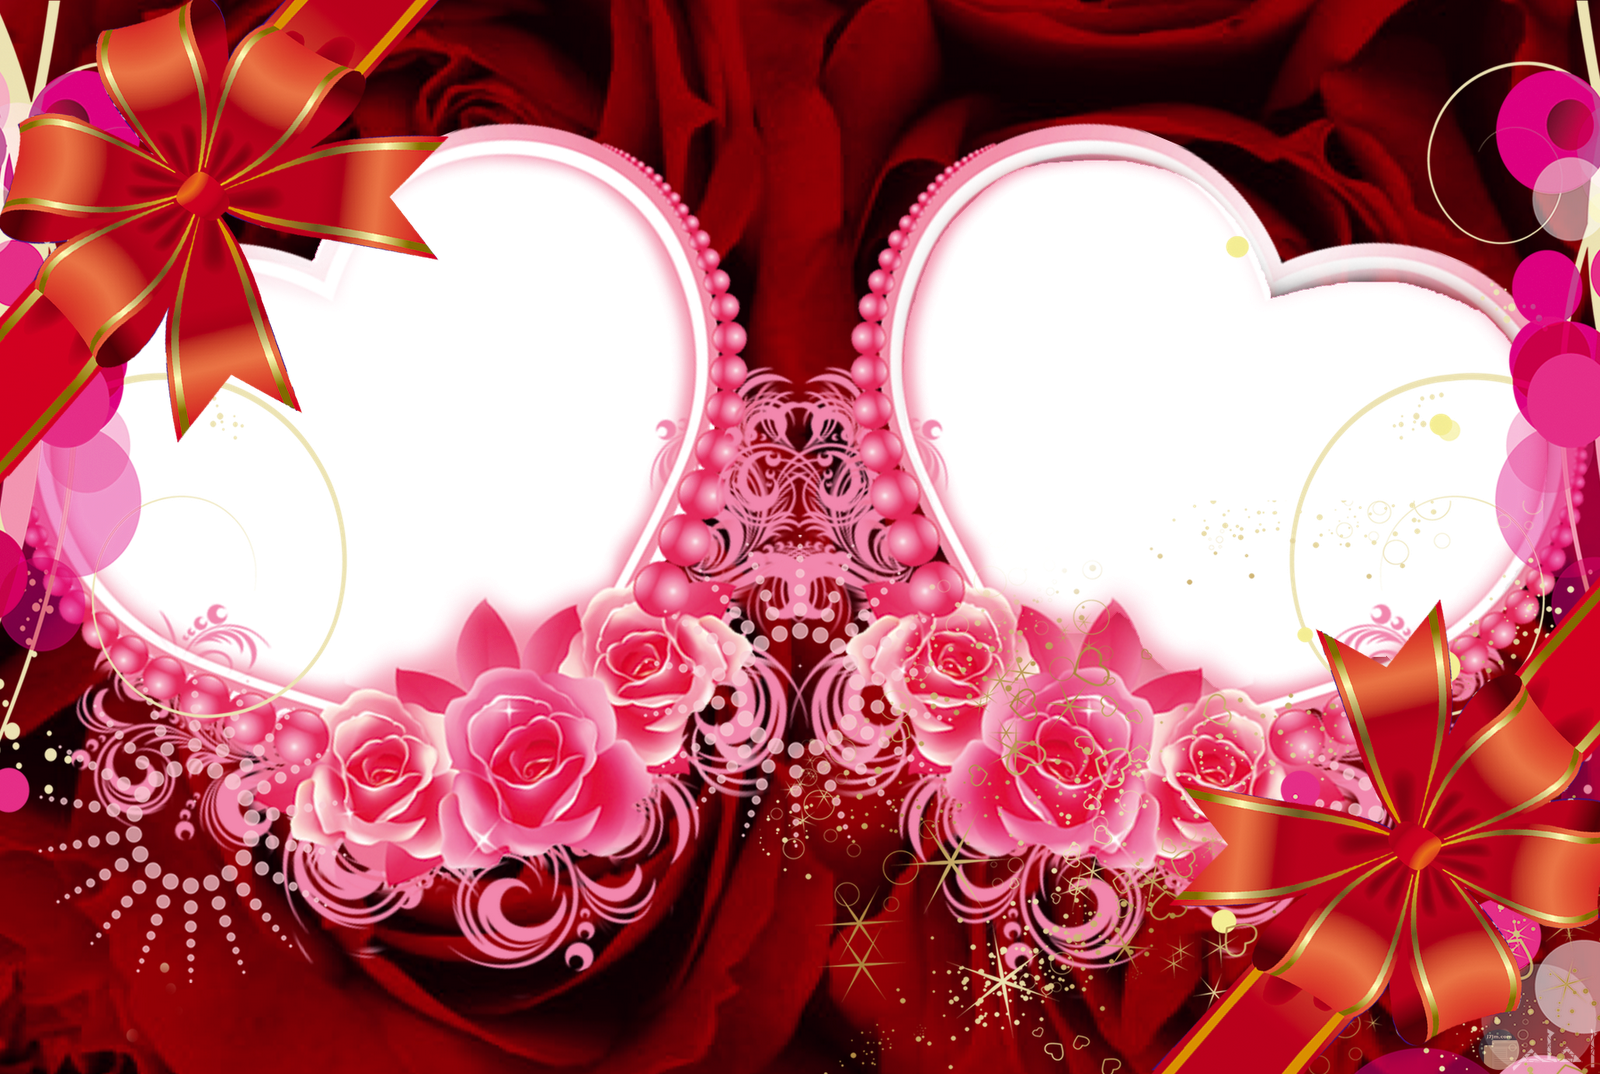 برواز قلوب وزهور